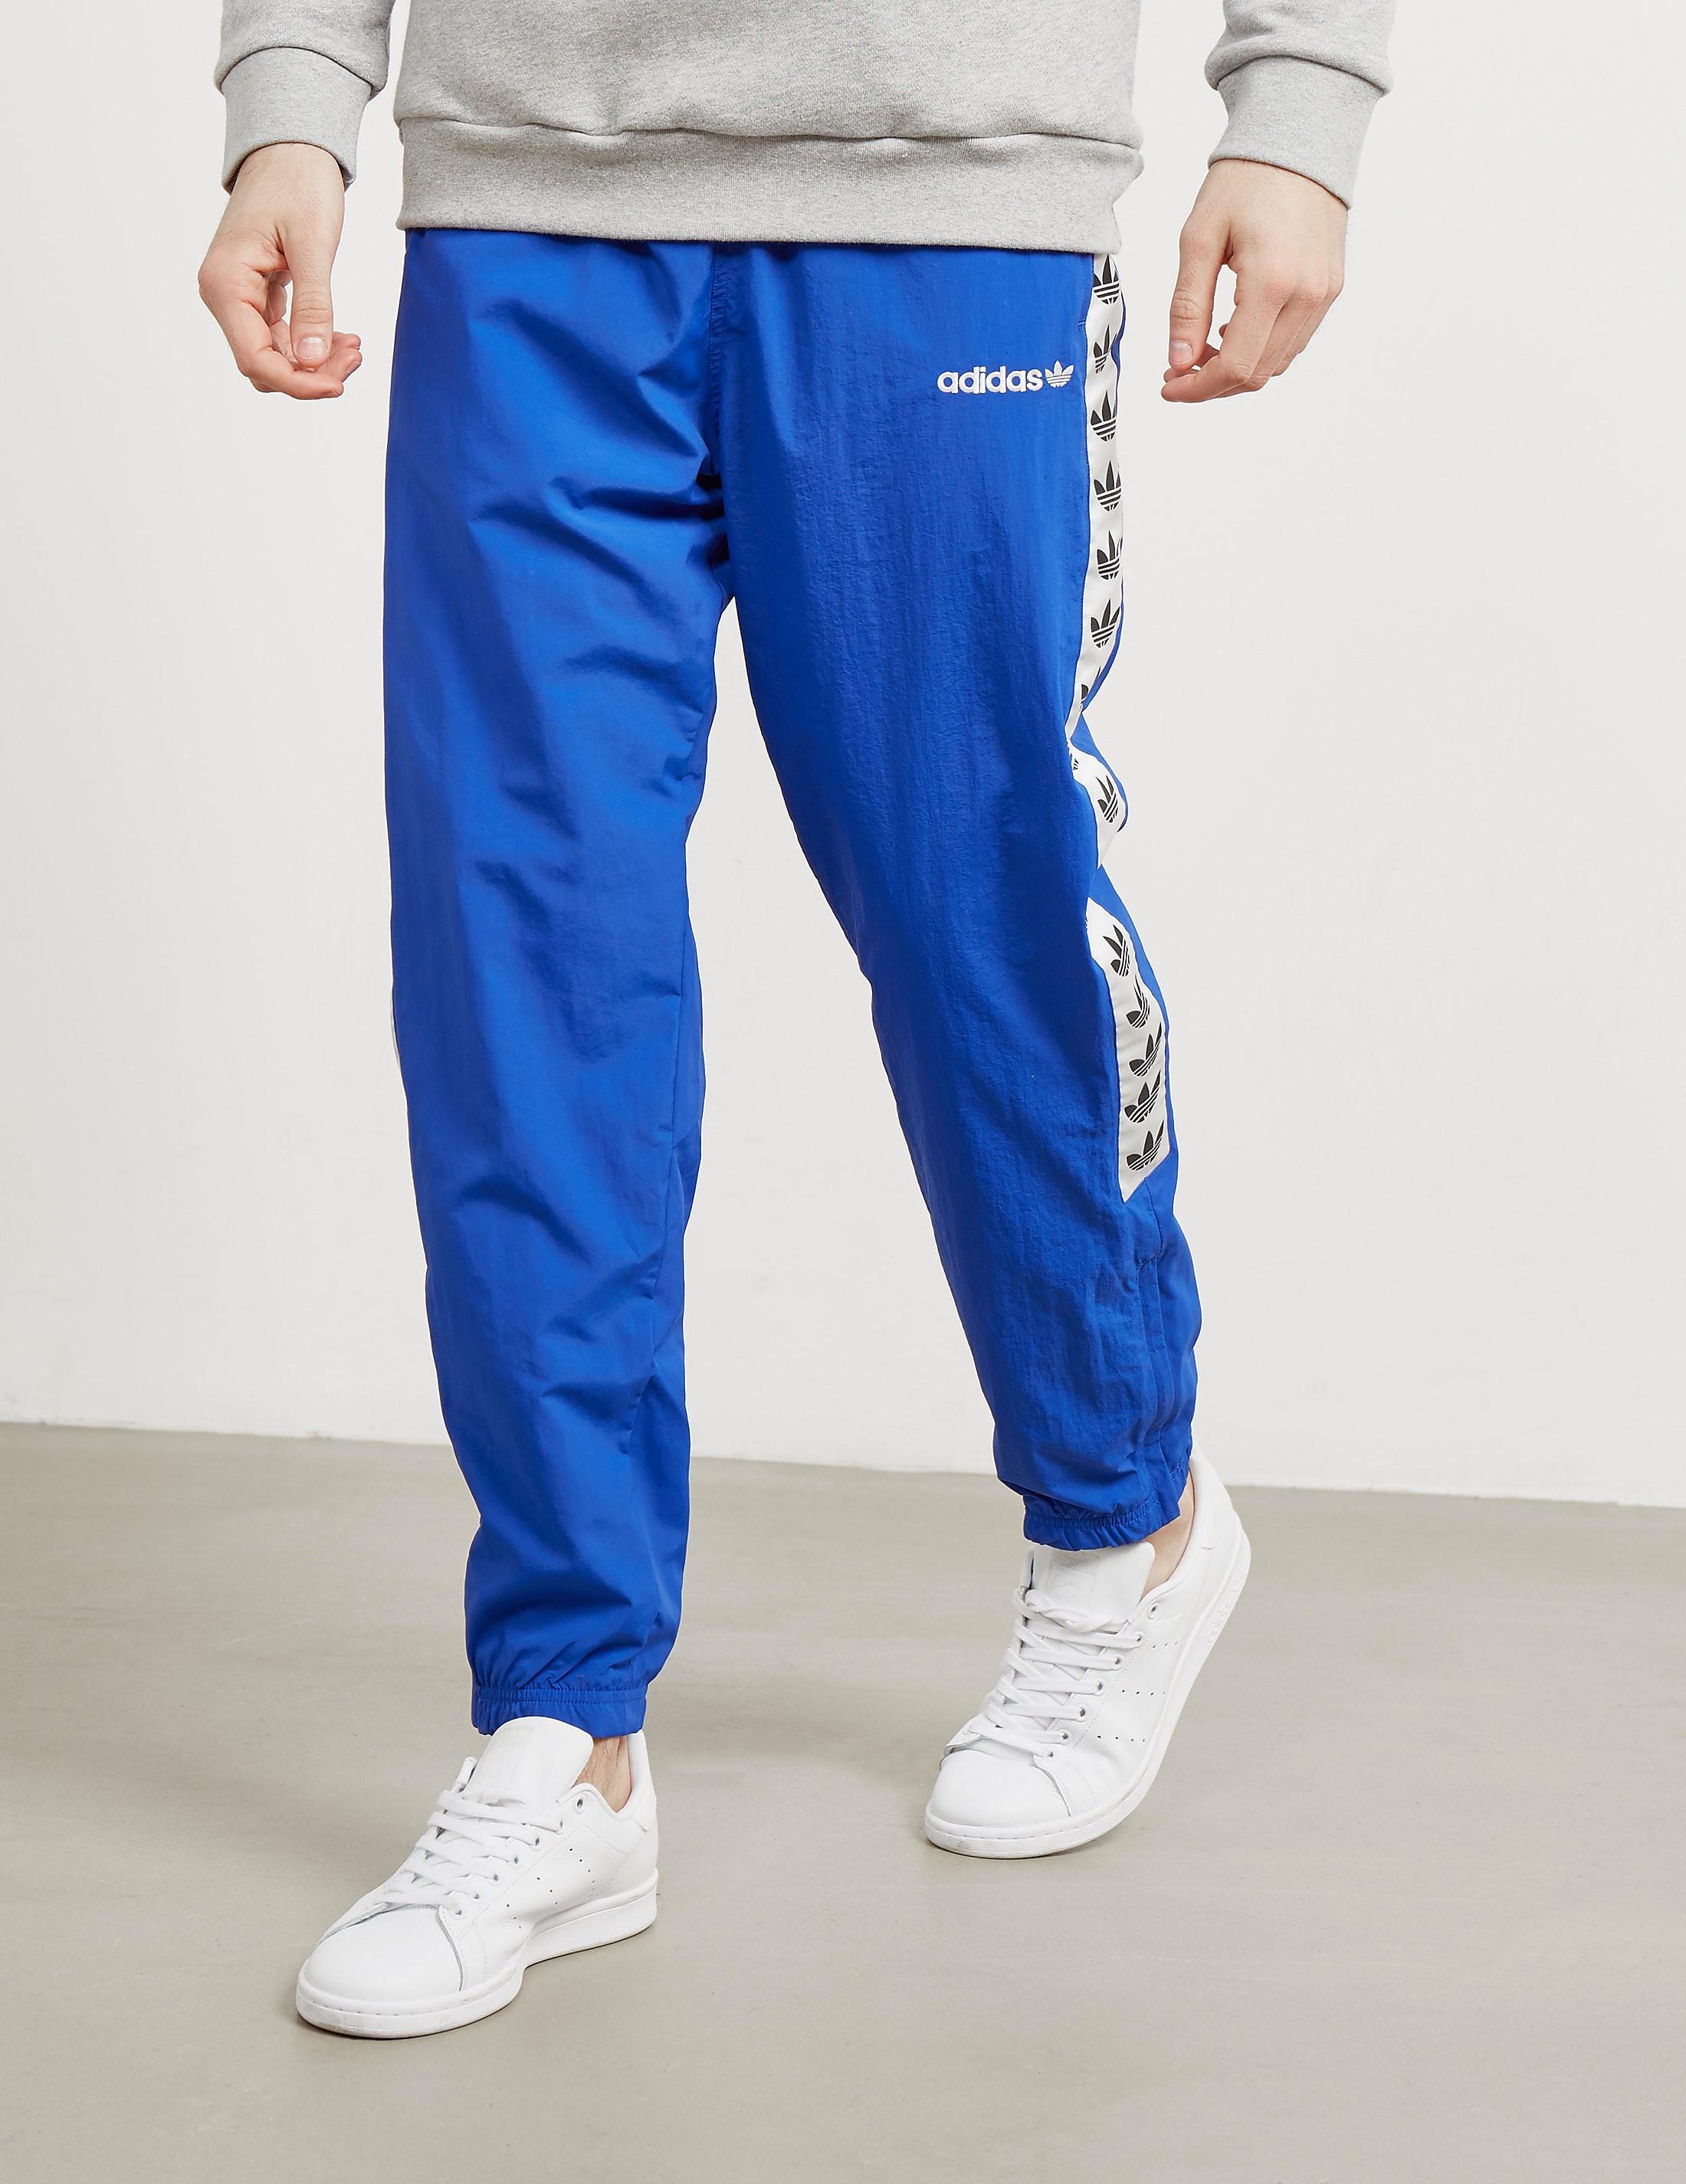 adidas Originals Taped Track Pants